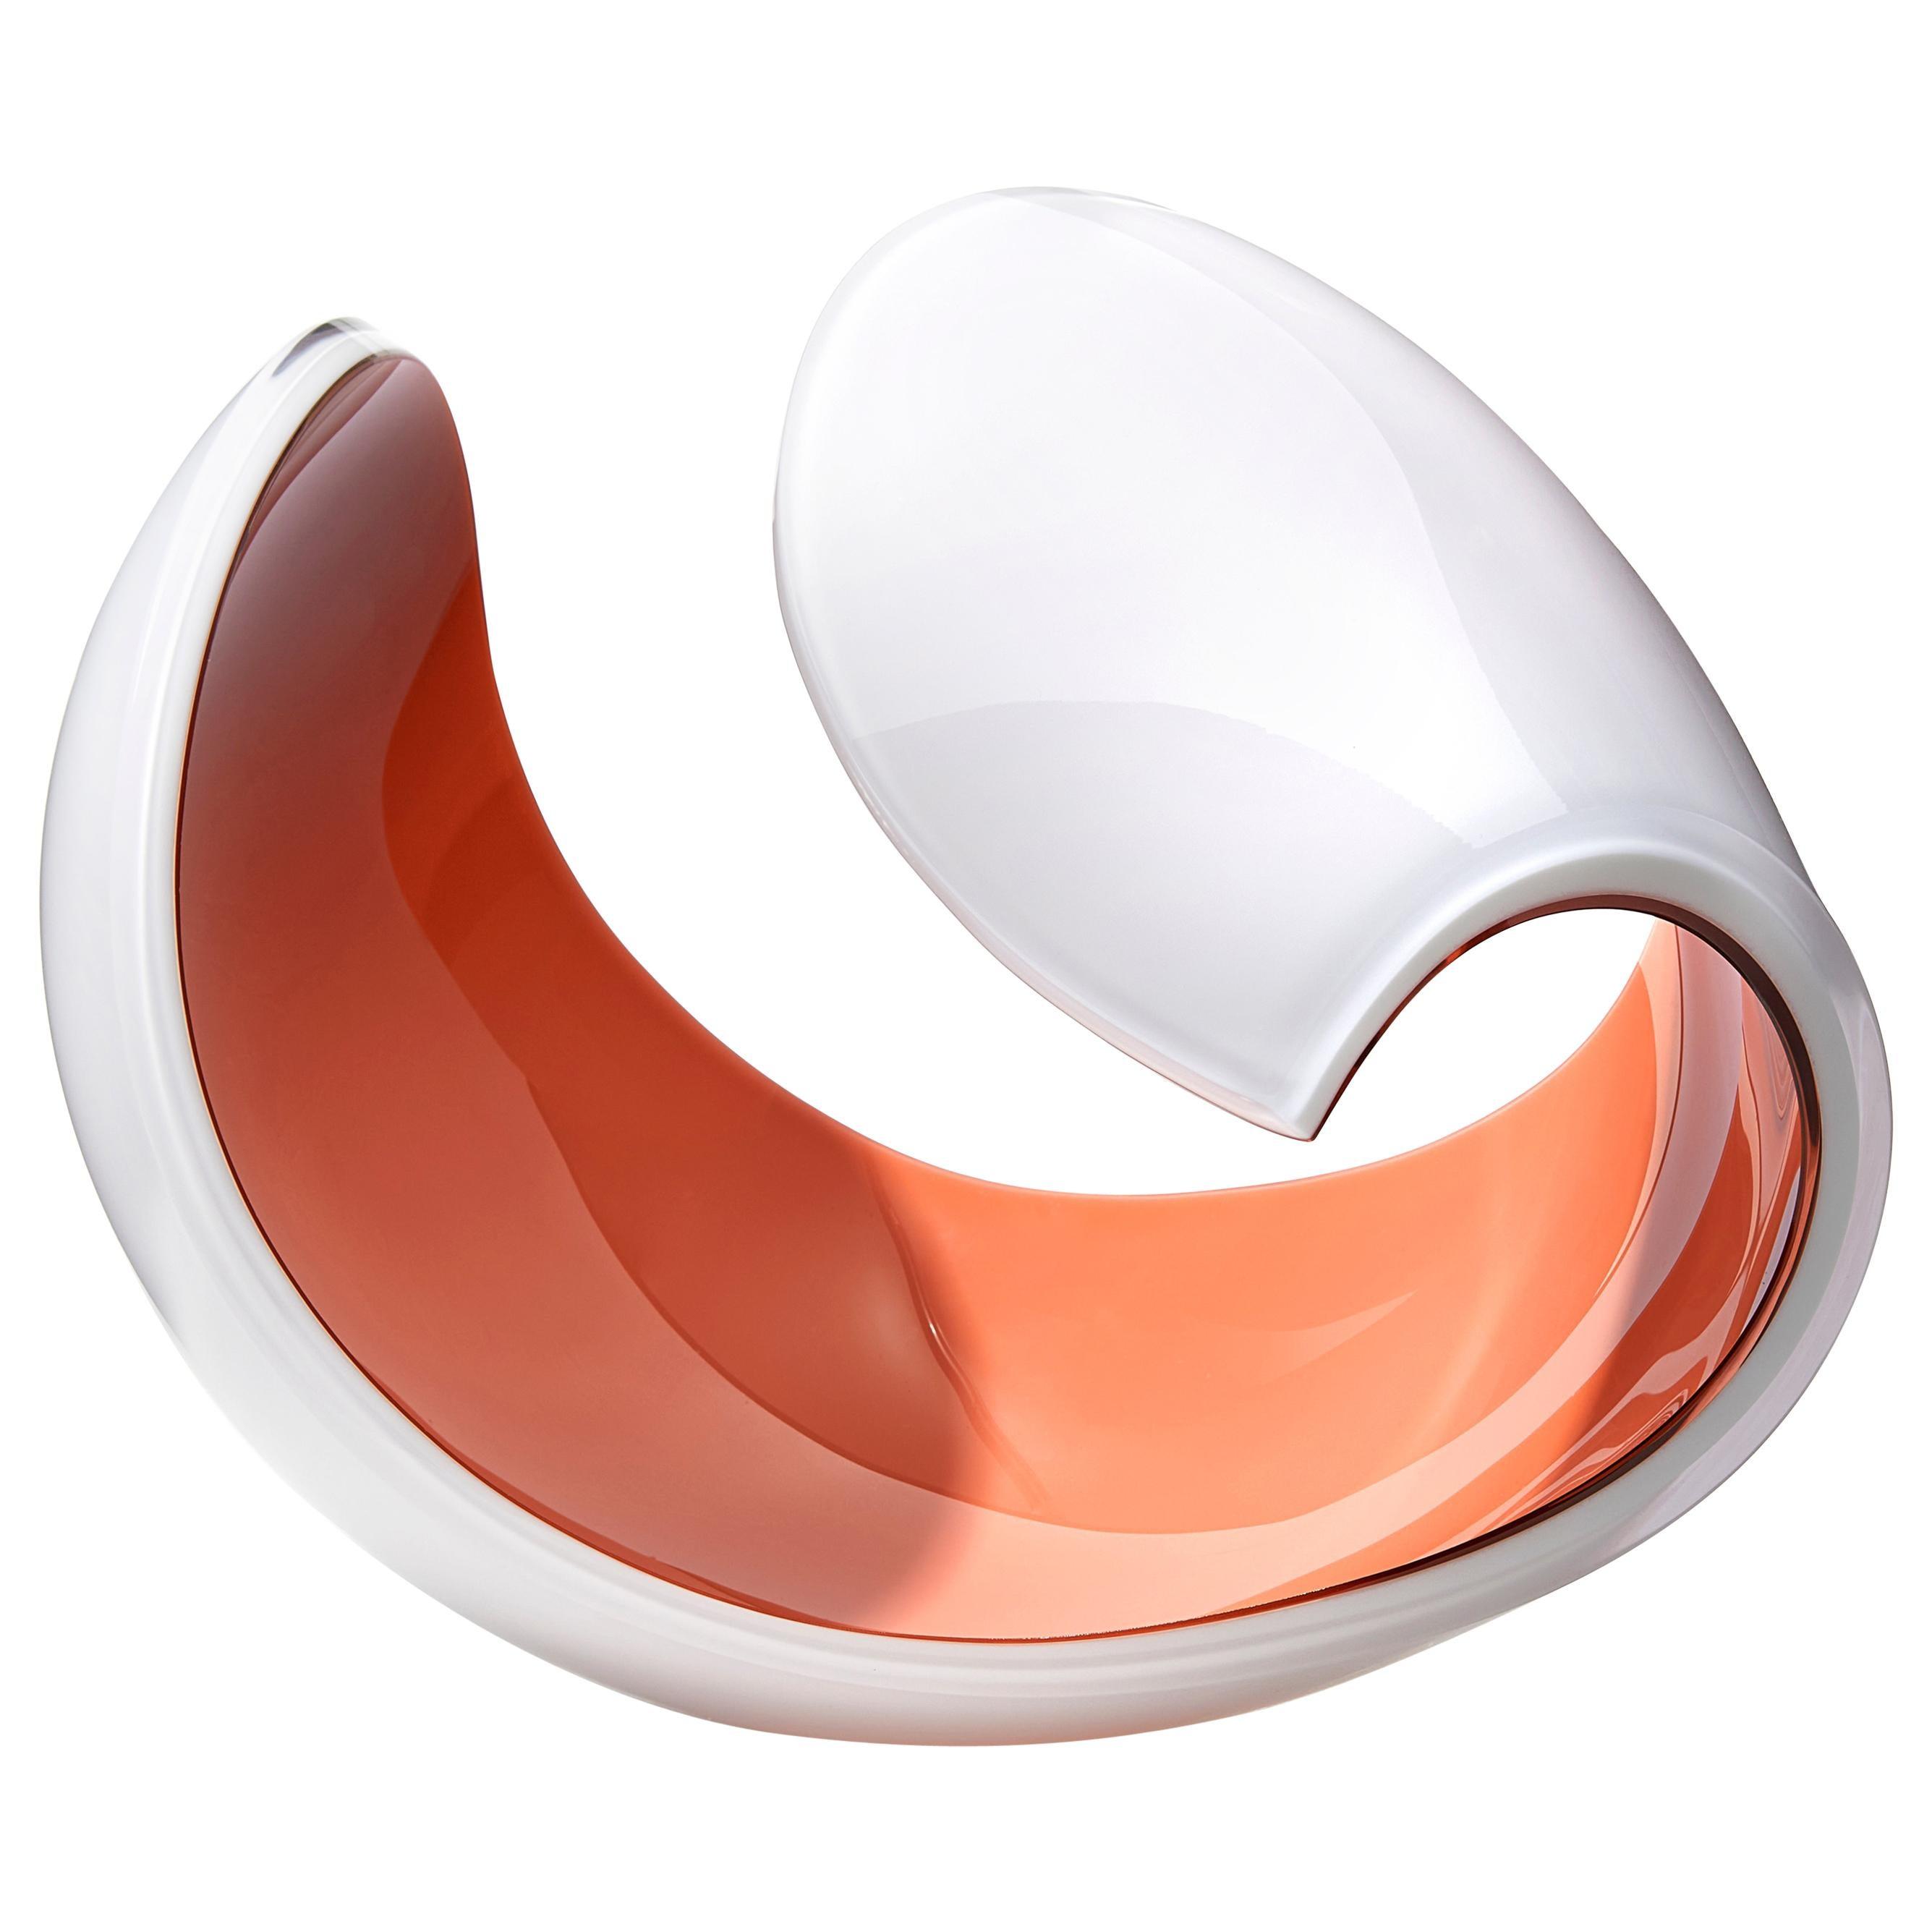 Planet in White and Peach, a Unique Art Glass Sculpture by Lena Bergström